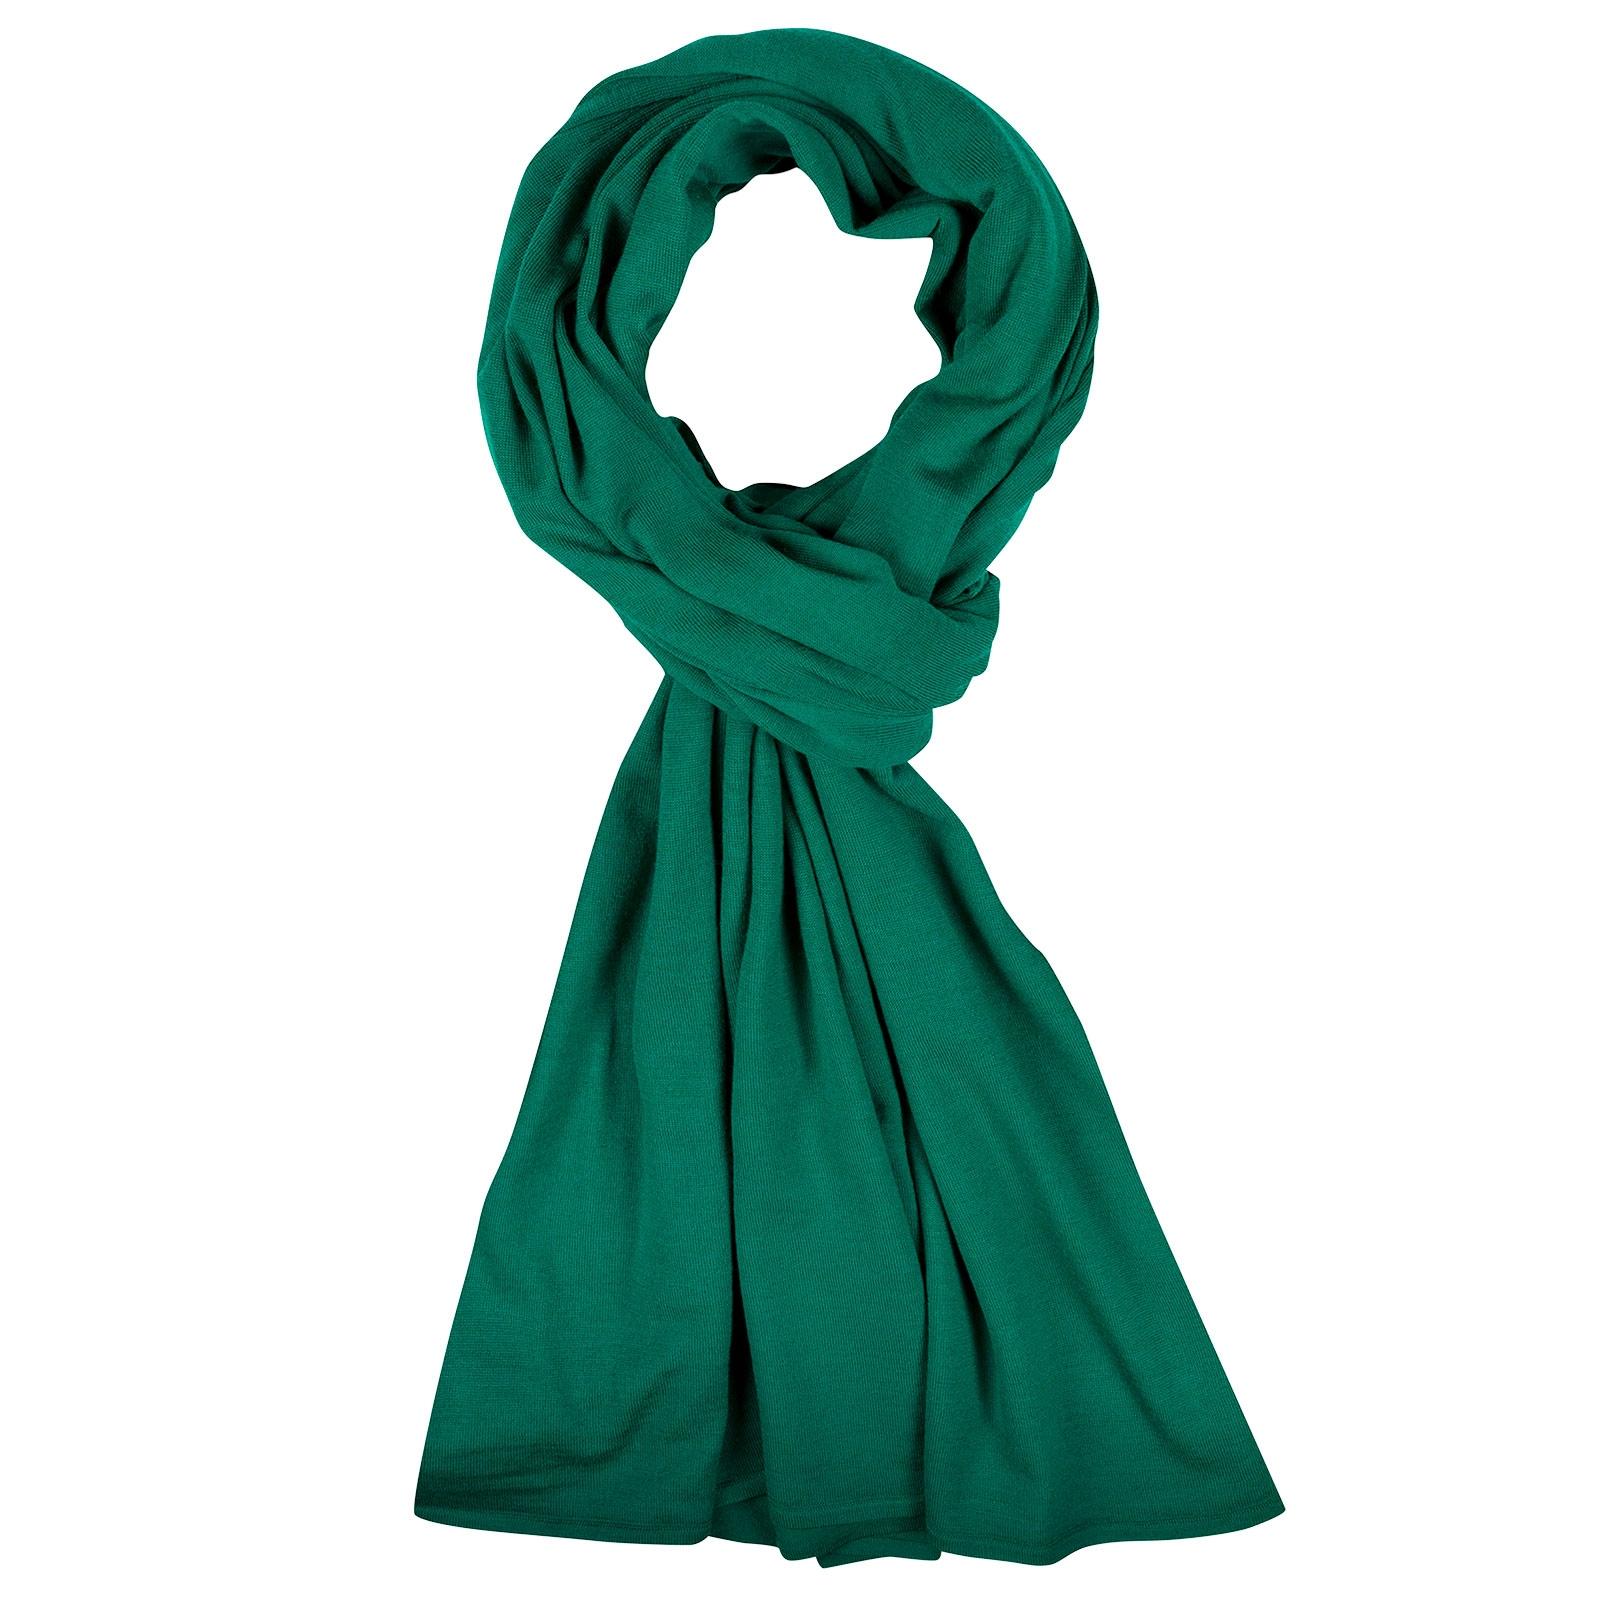 John Smedley Wings Merino Wool Shawl in Boron Green-ONE